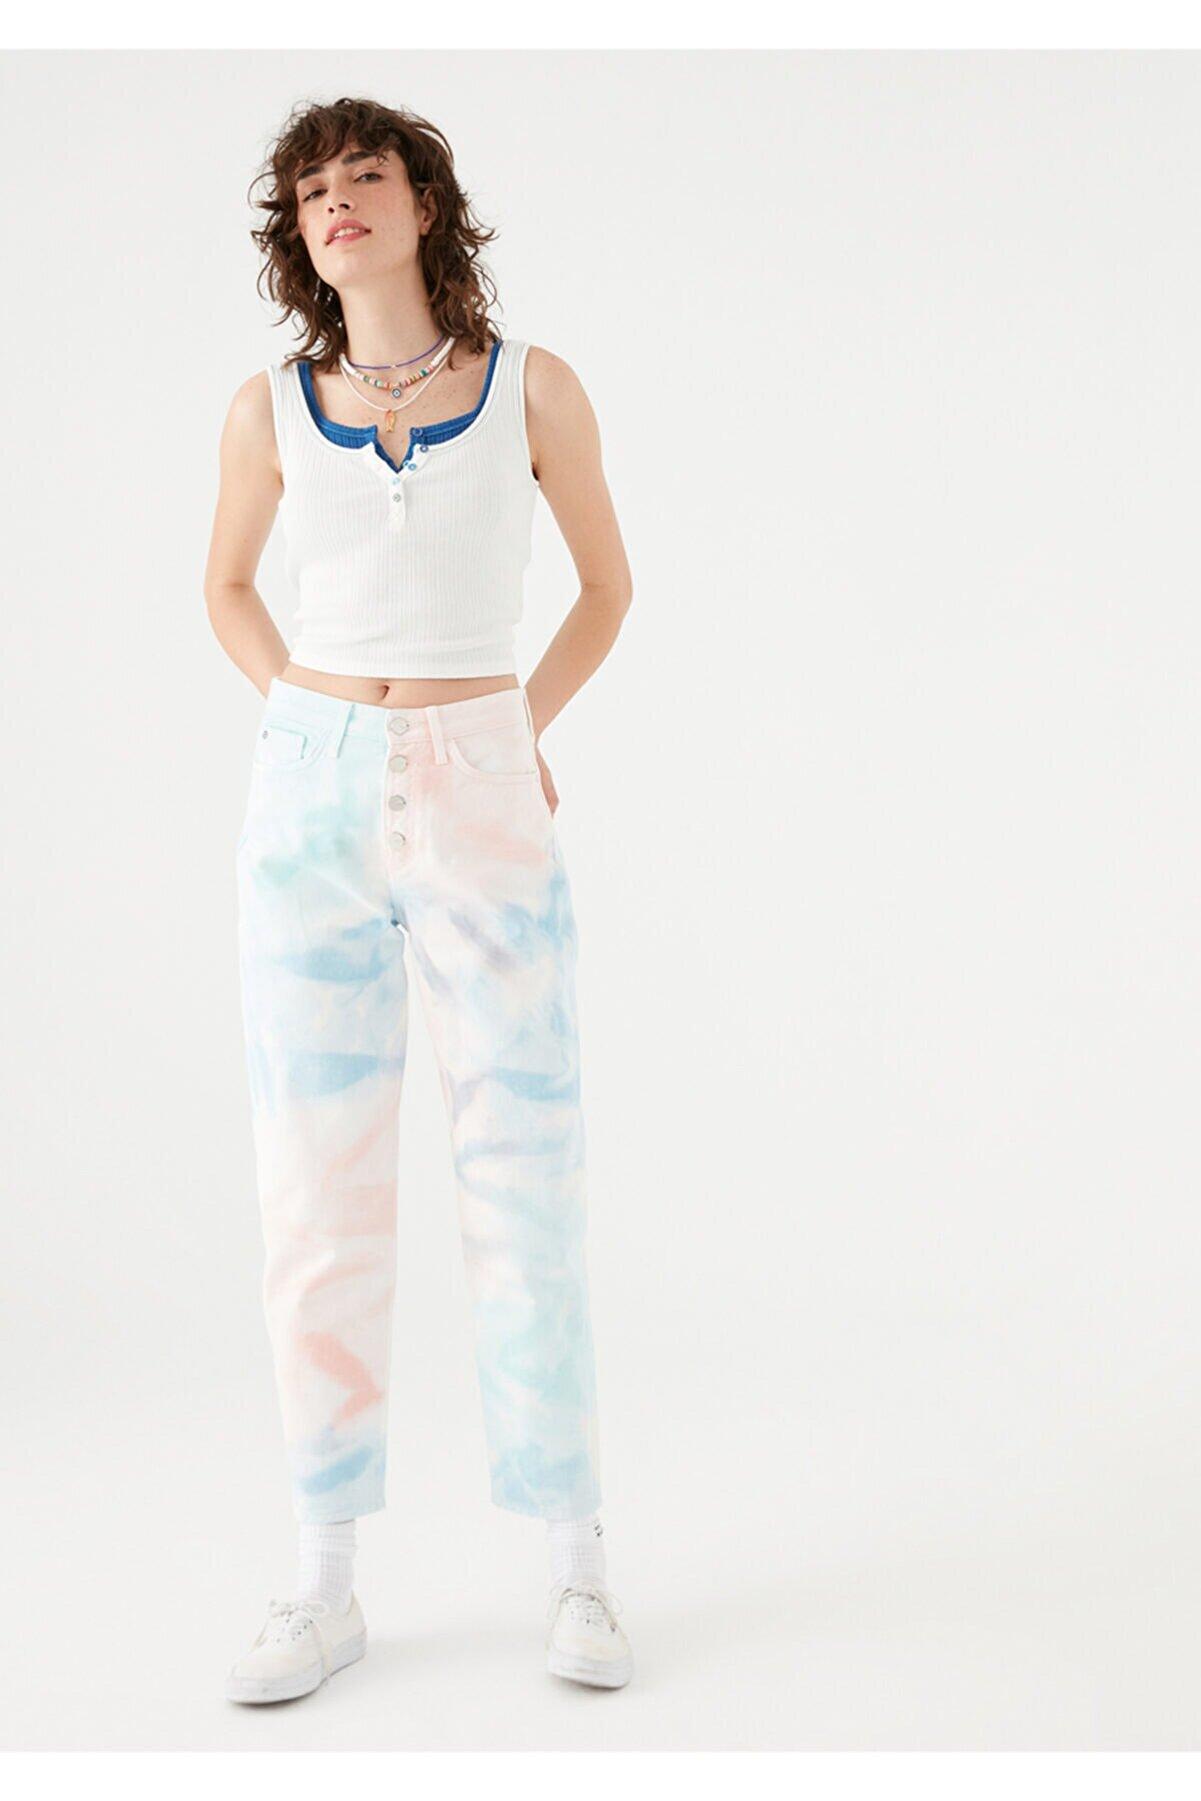 Mavi Lila Nazar Boncuğu Detaylı Renkli Batik Jean Pantolon 101354-35280